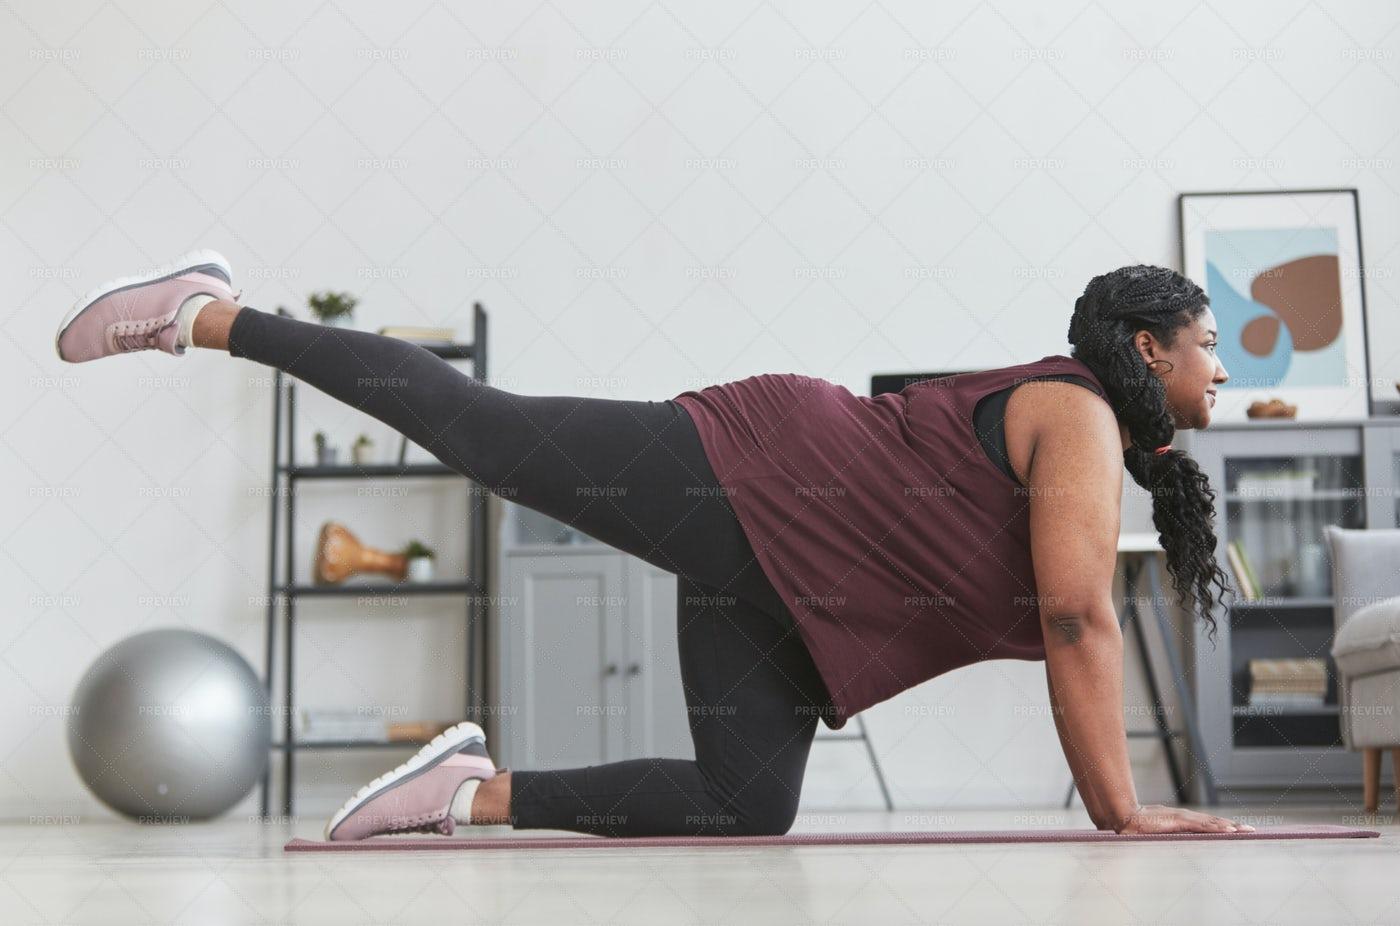 Woman Stretching On Yoga Mat: Stock Photos